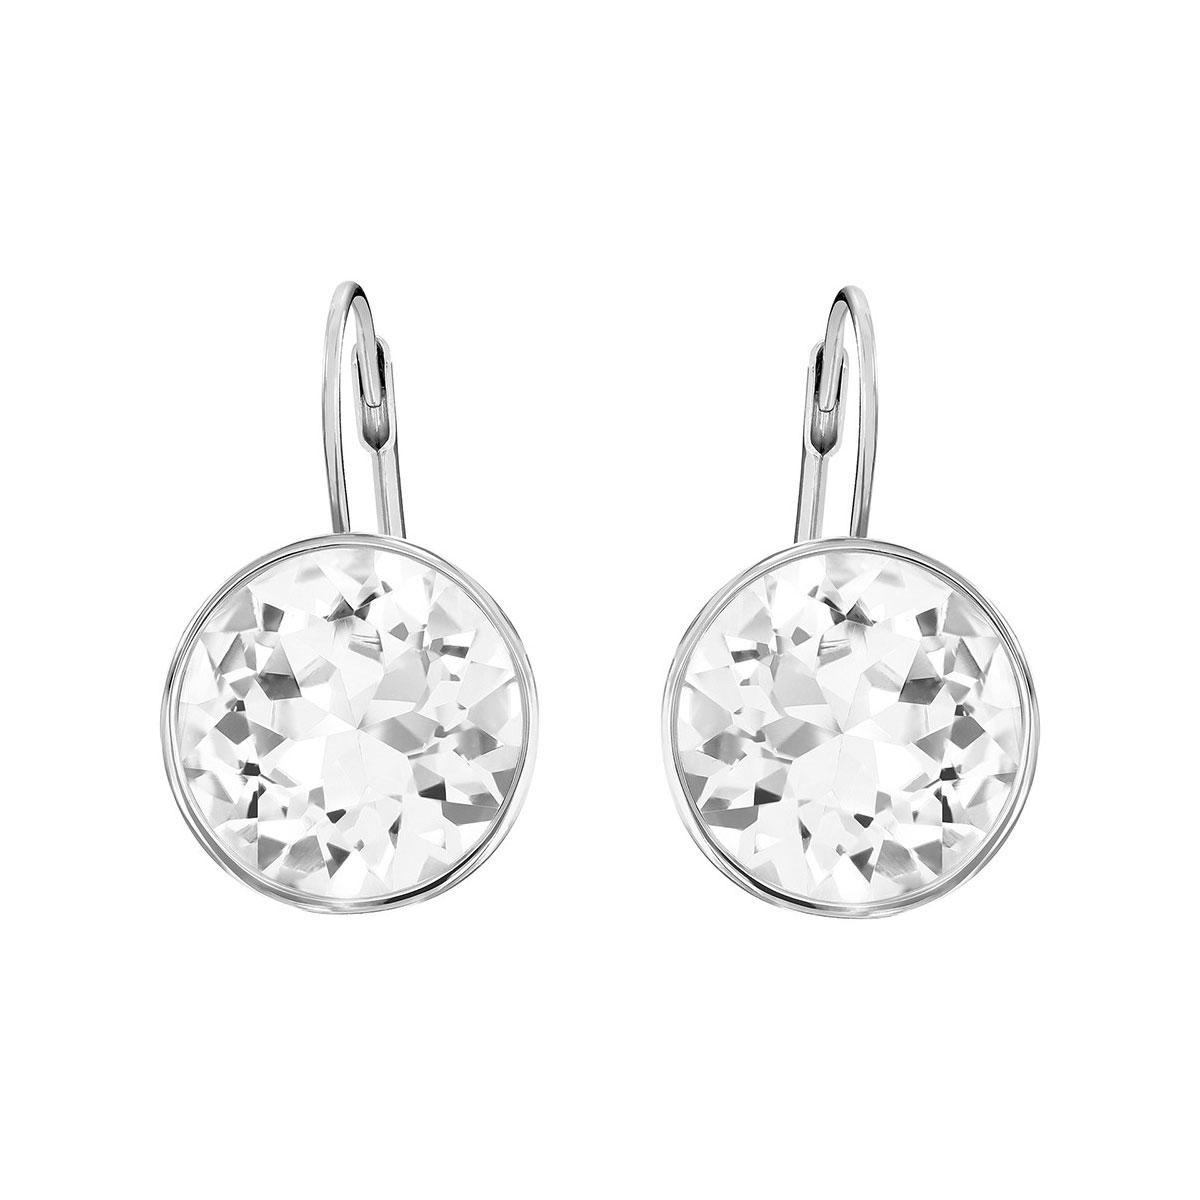 Swarovski Bella Clear and Rhodium Pierced Earrings, Pair